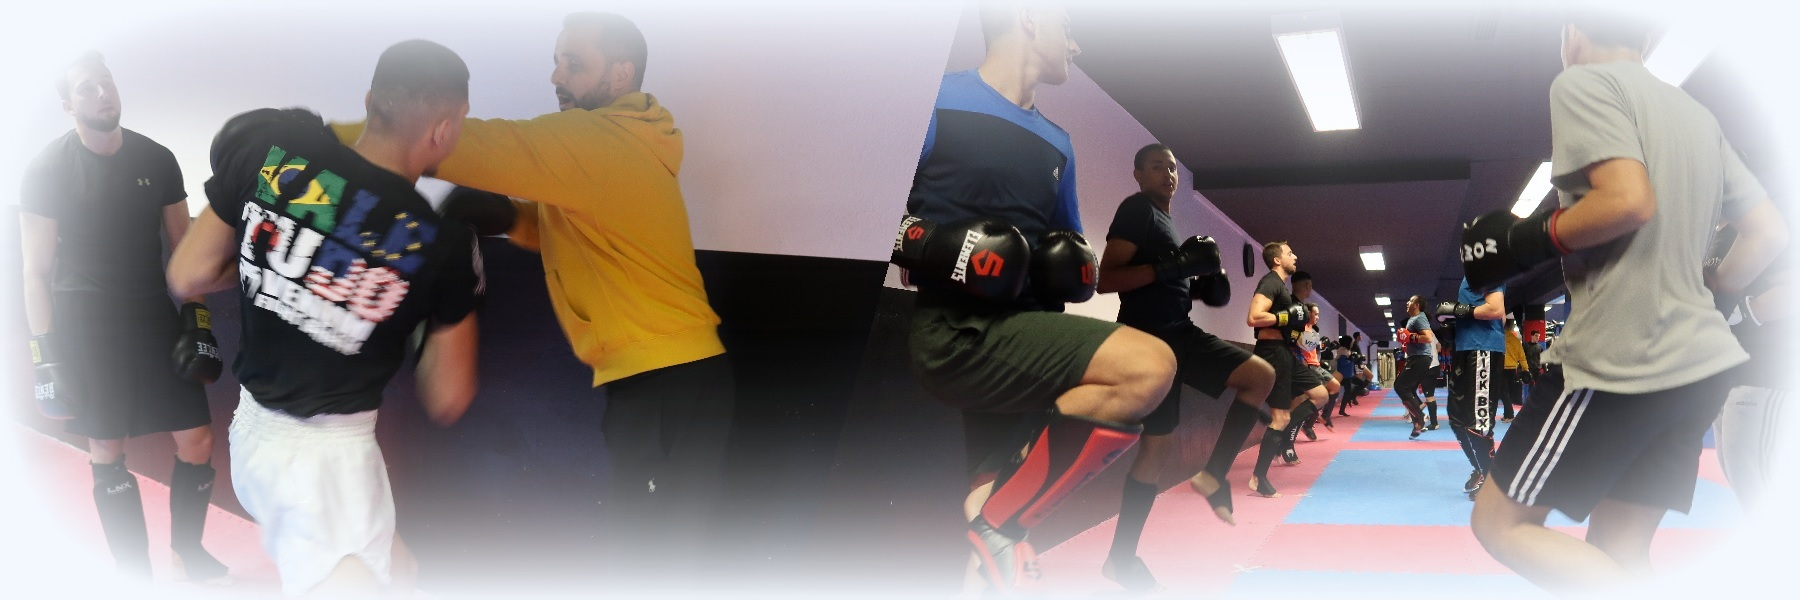 Kickboxen-Header-3